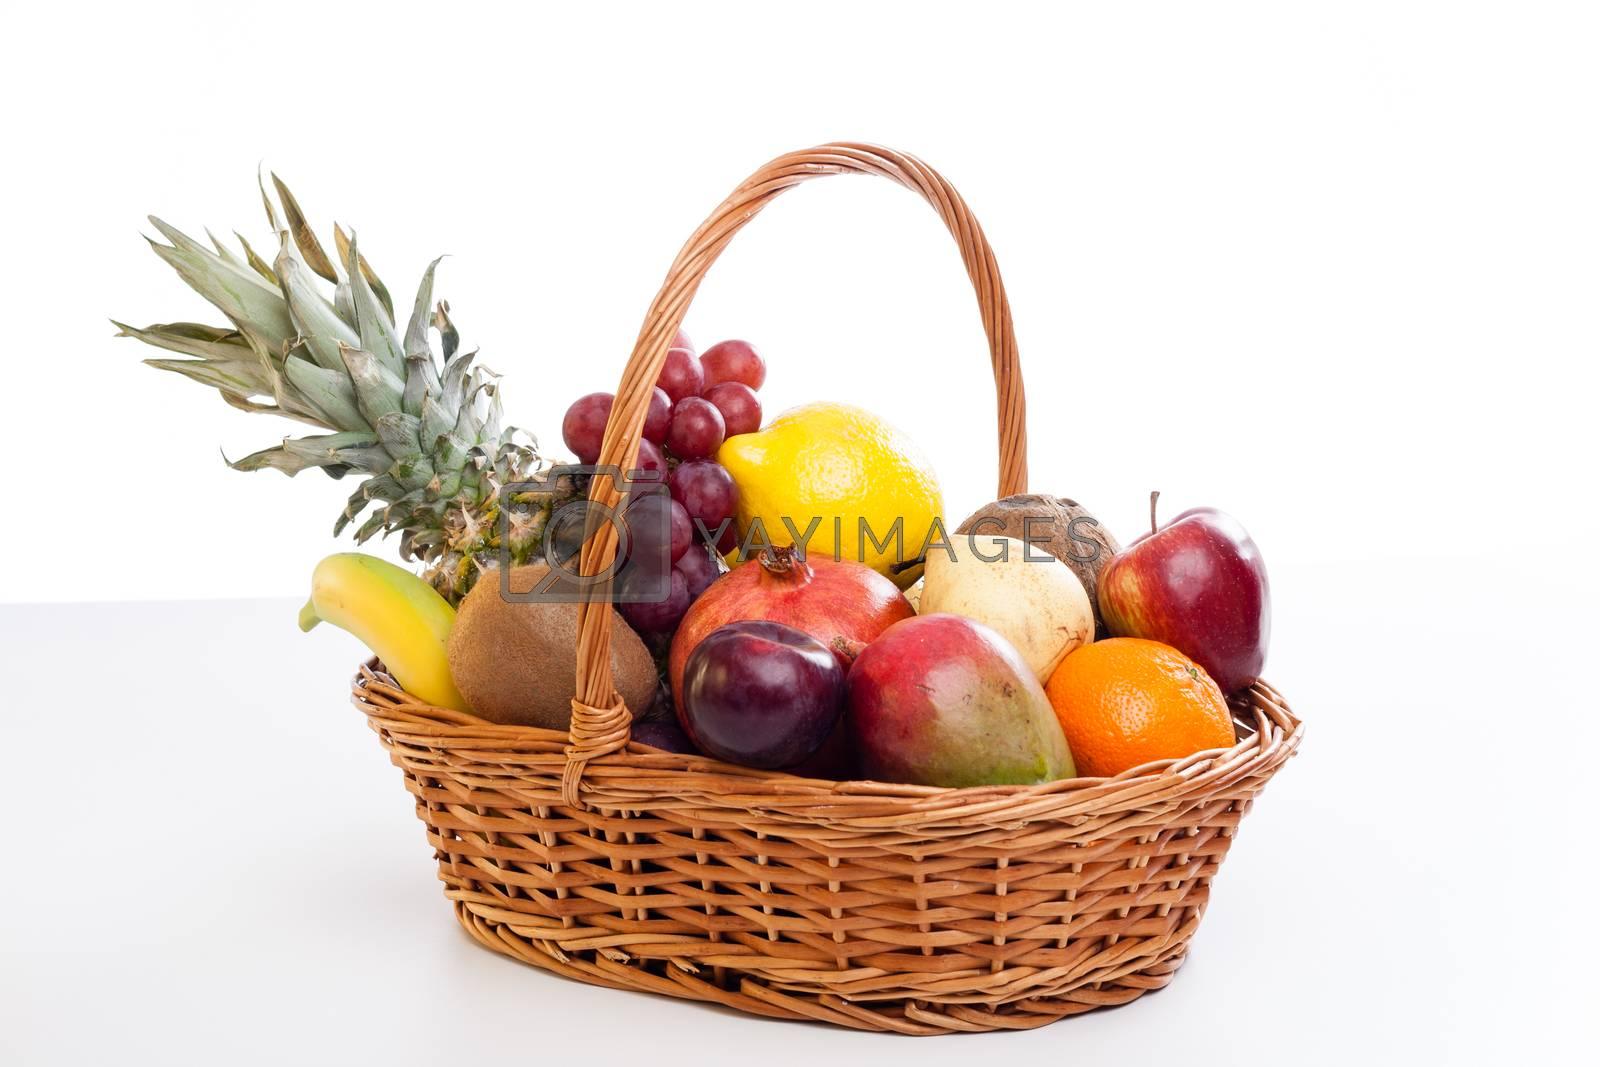 Royalty free image of Fruit basket by furo_felix